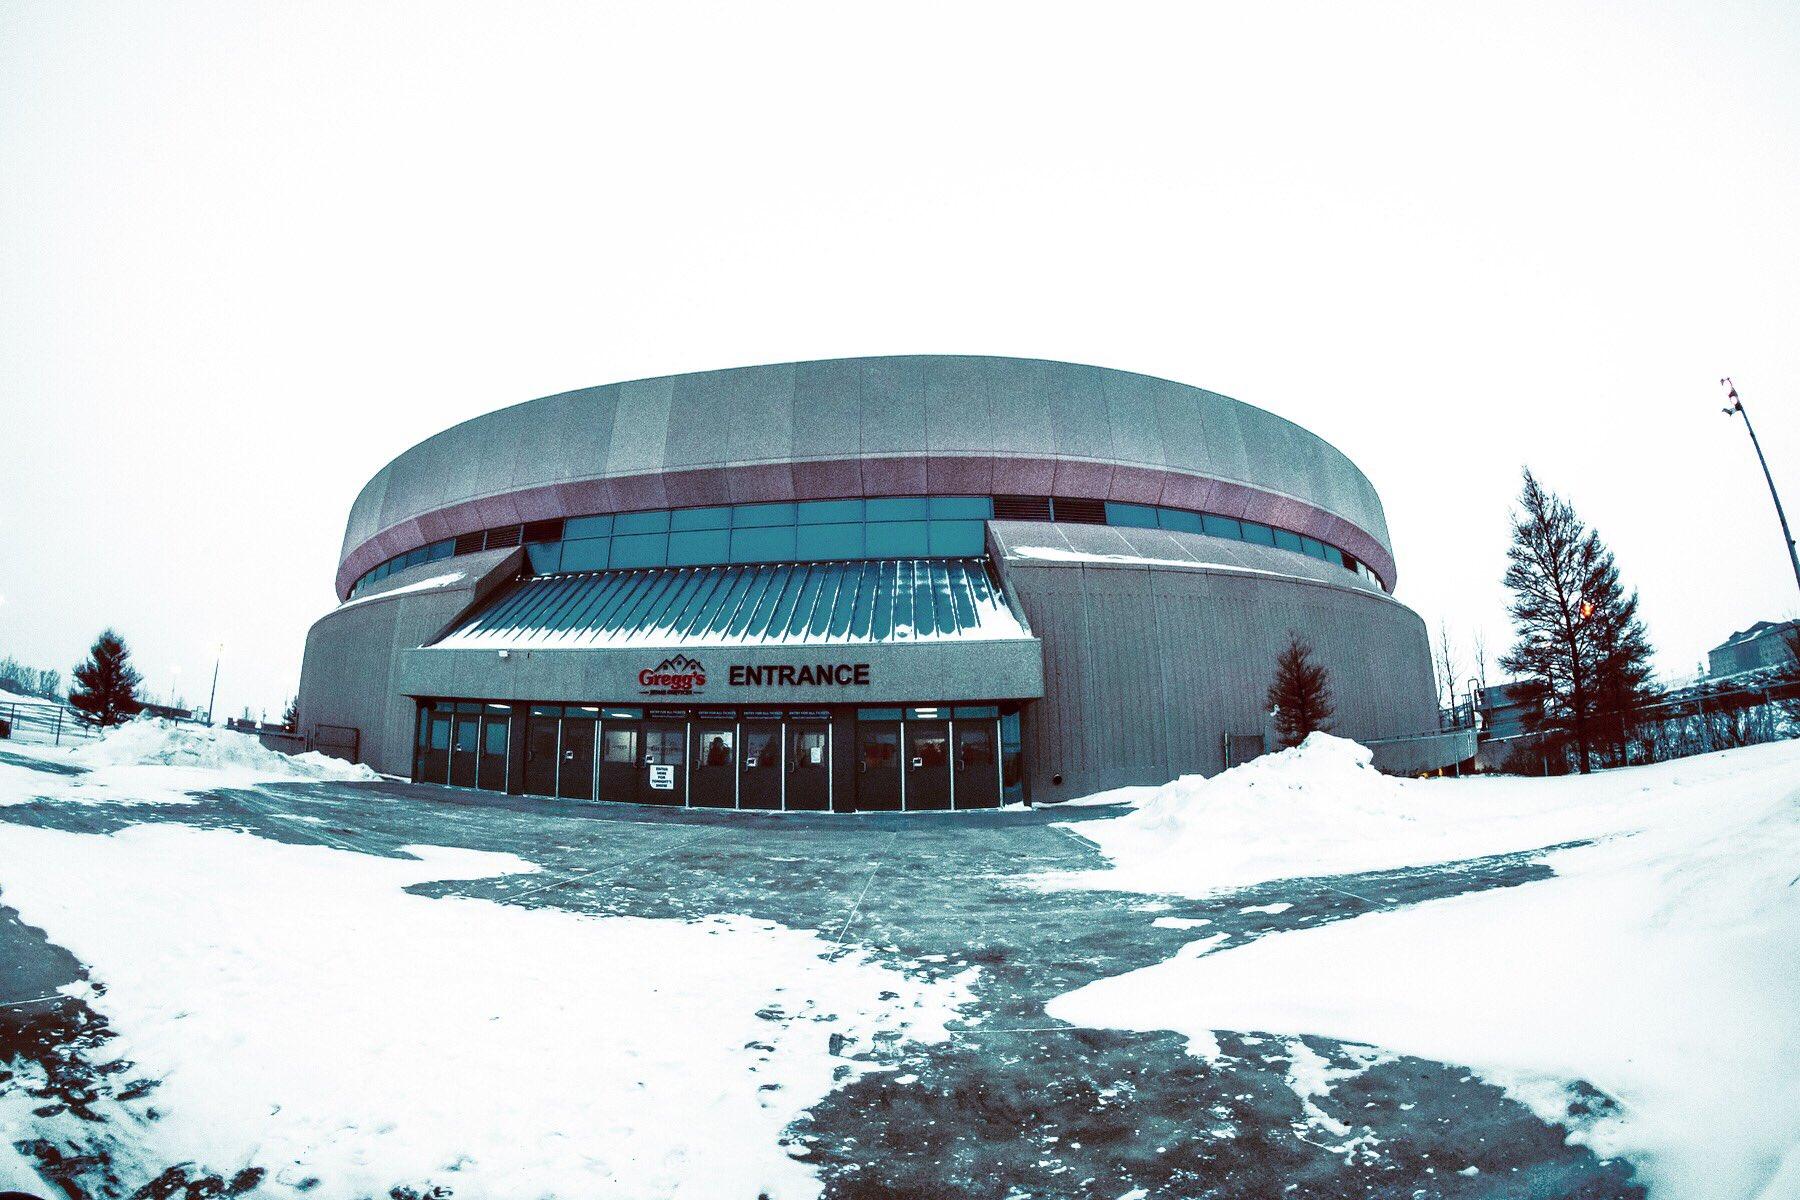 A bit brisk here in Saskatoon today. ❄️❄️❄️ #thestageworldtour #avengedsevenfold ��:@rafacore https://t.co/0uaZMOl6jI